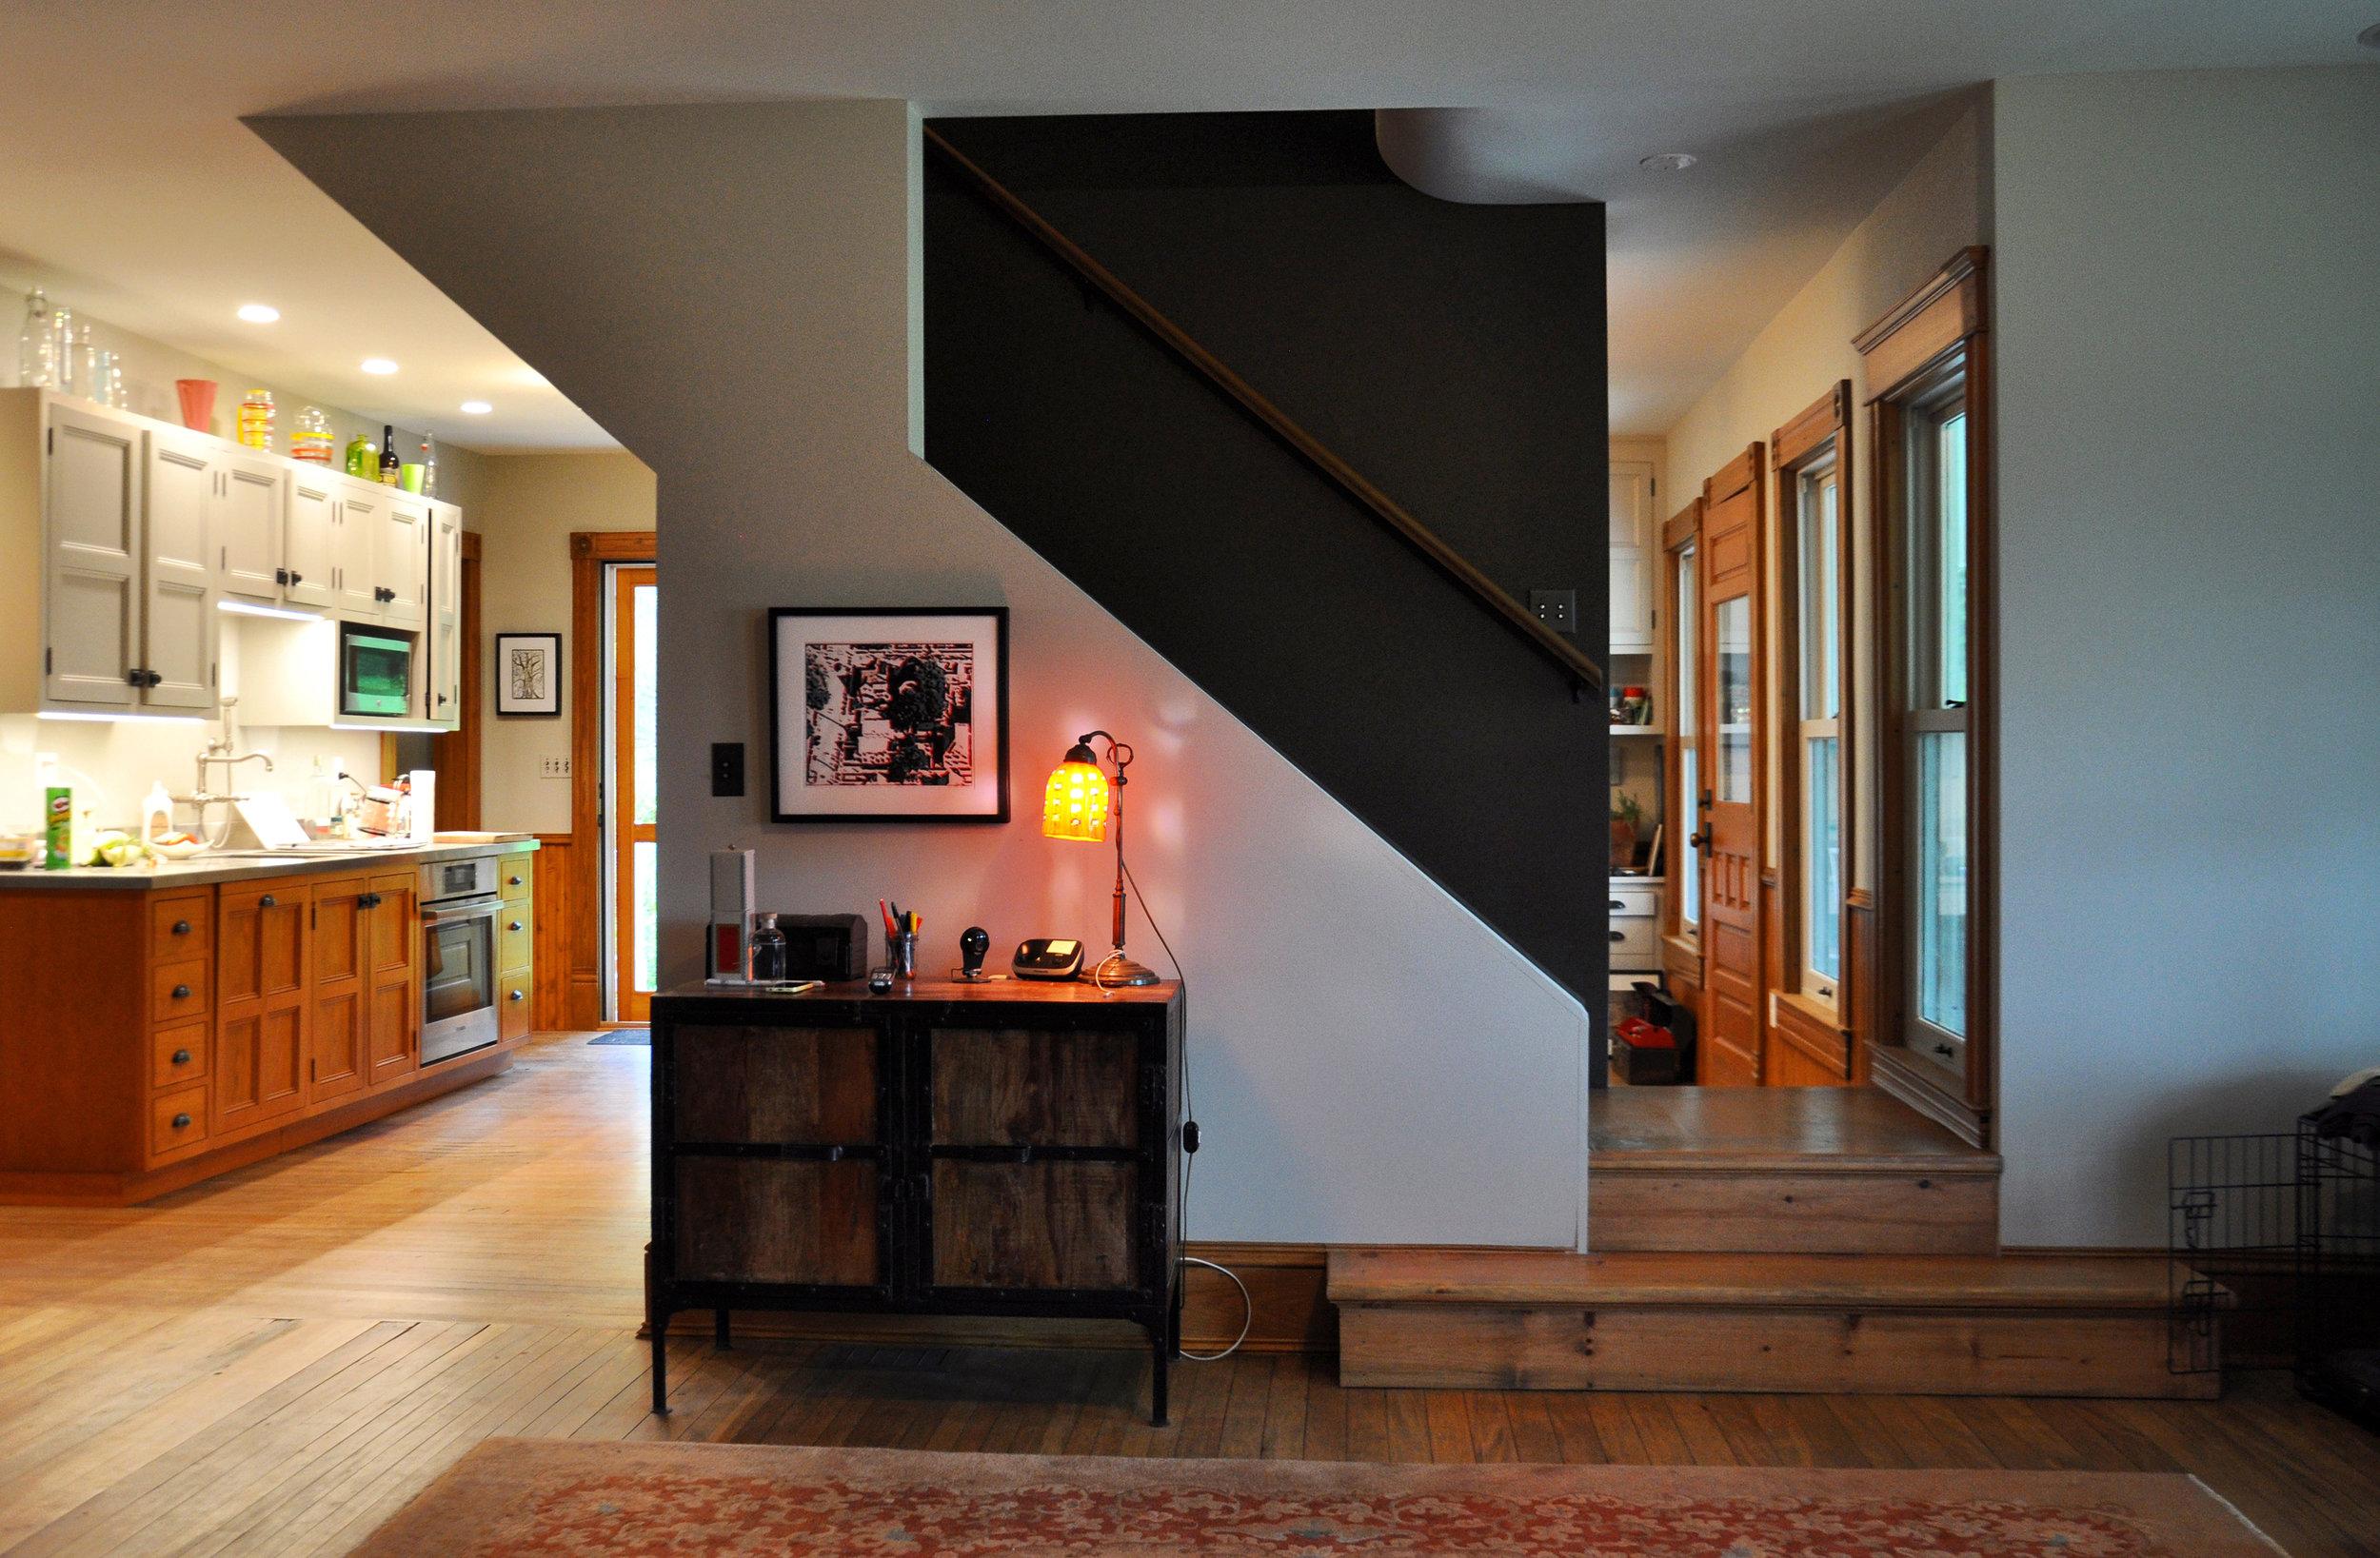 modernized rural farmhouse, residential renovation, interior stairs, new kitchen, new interior finishes, open plan